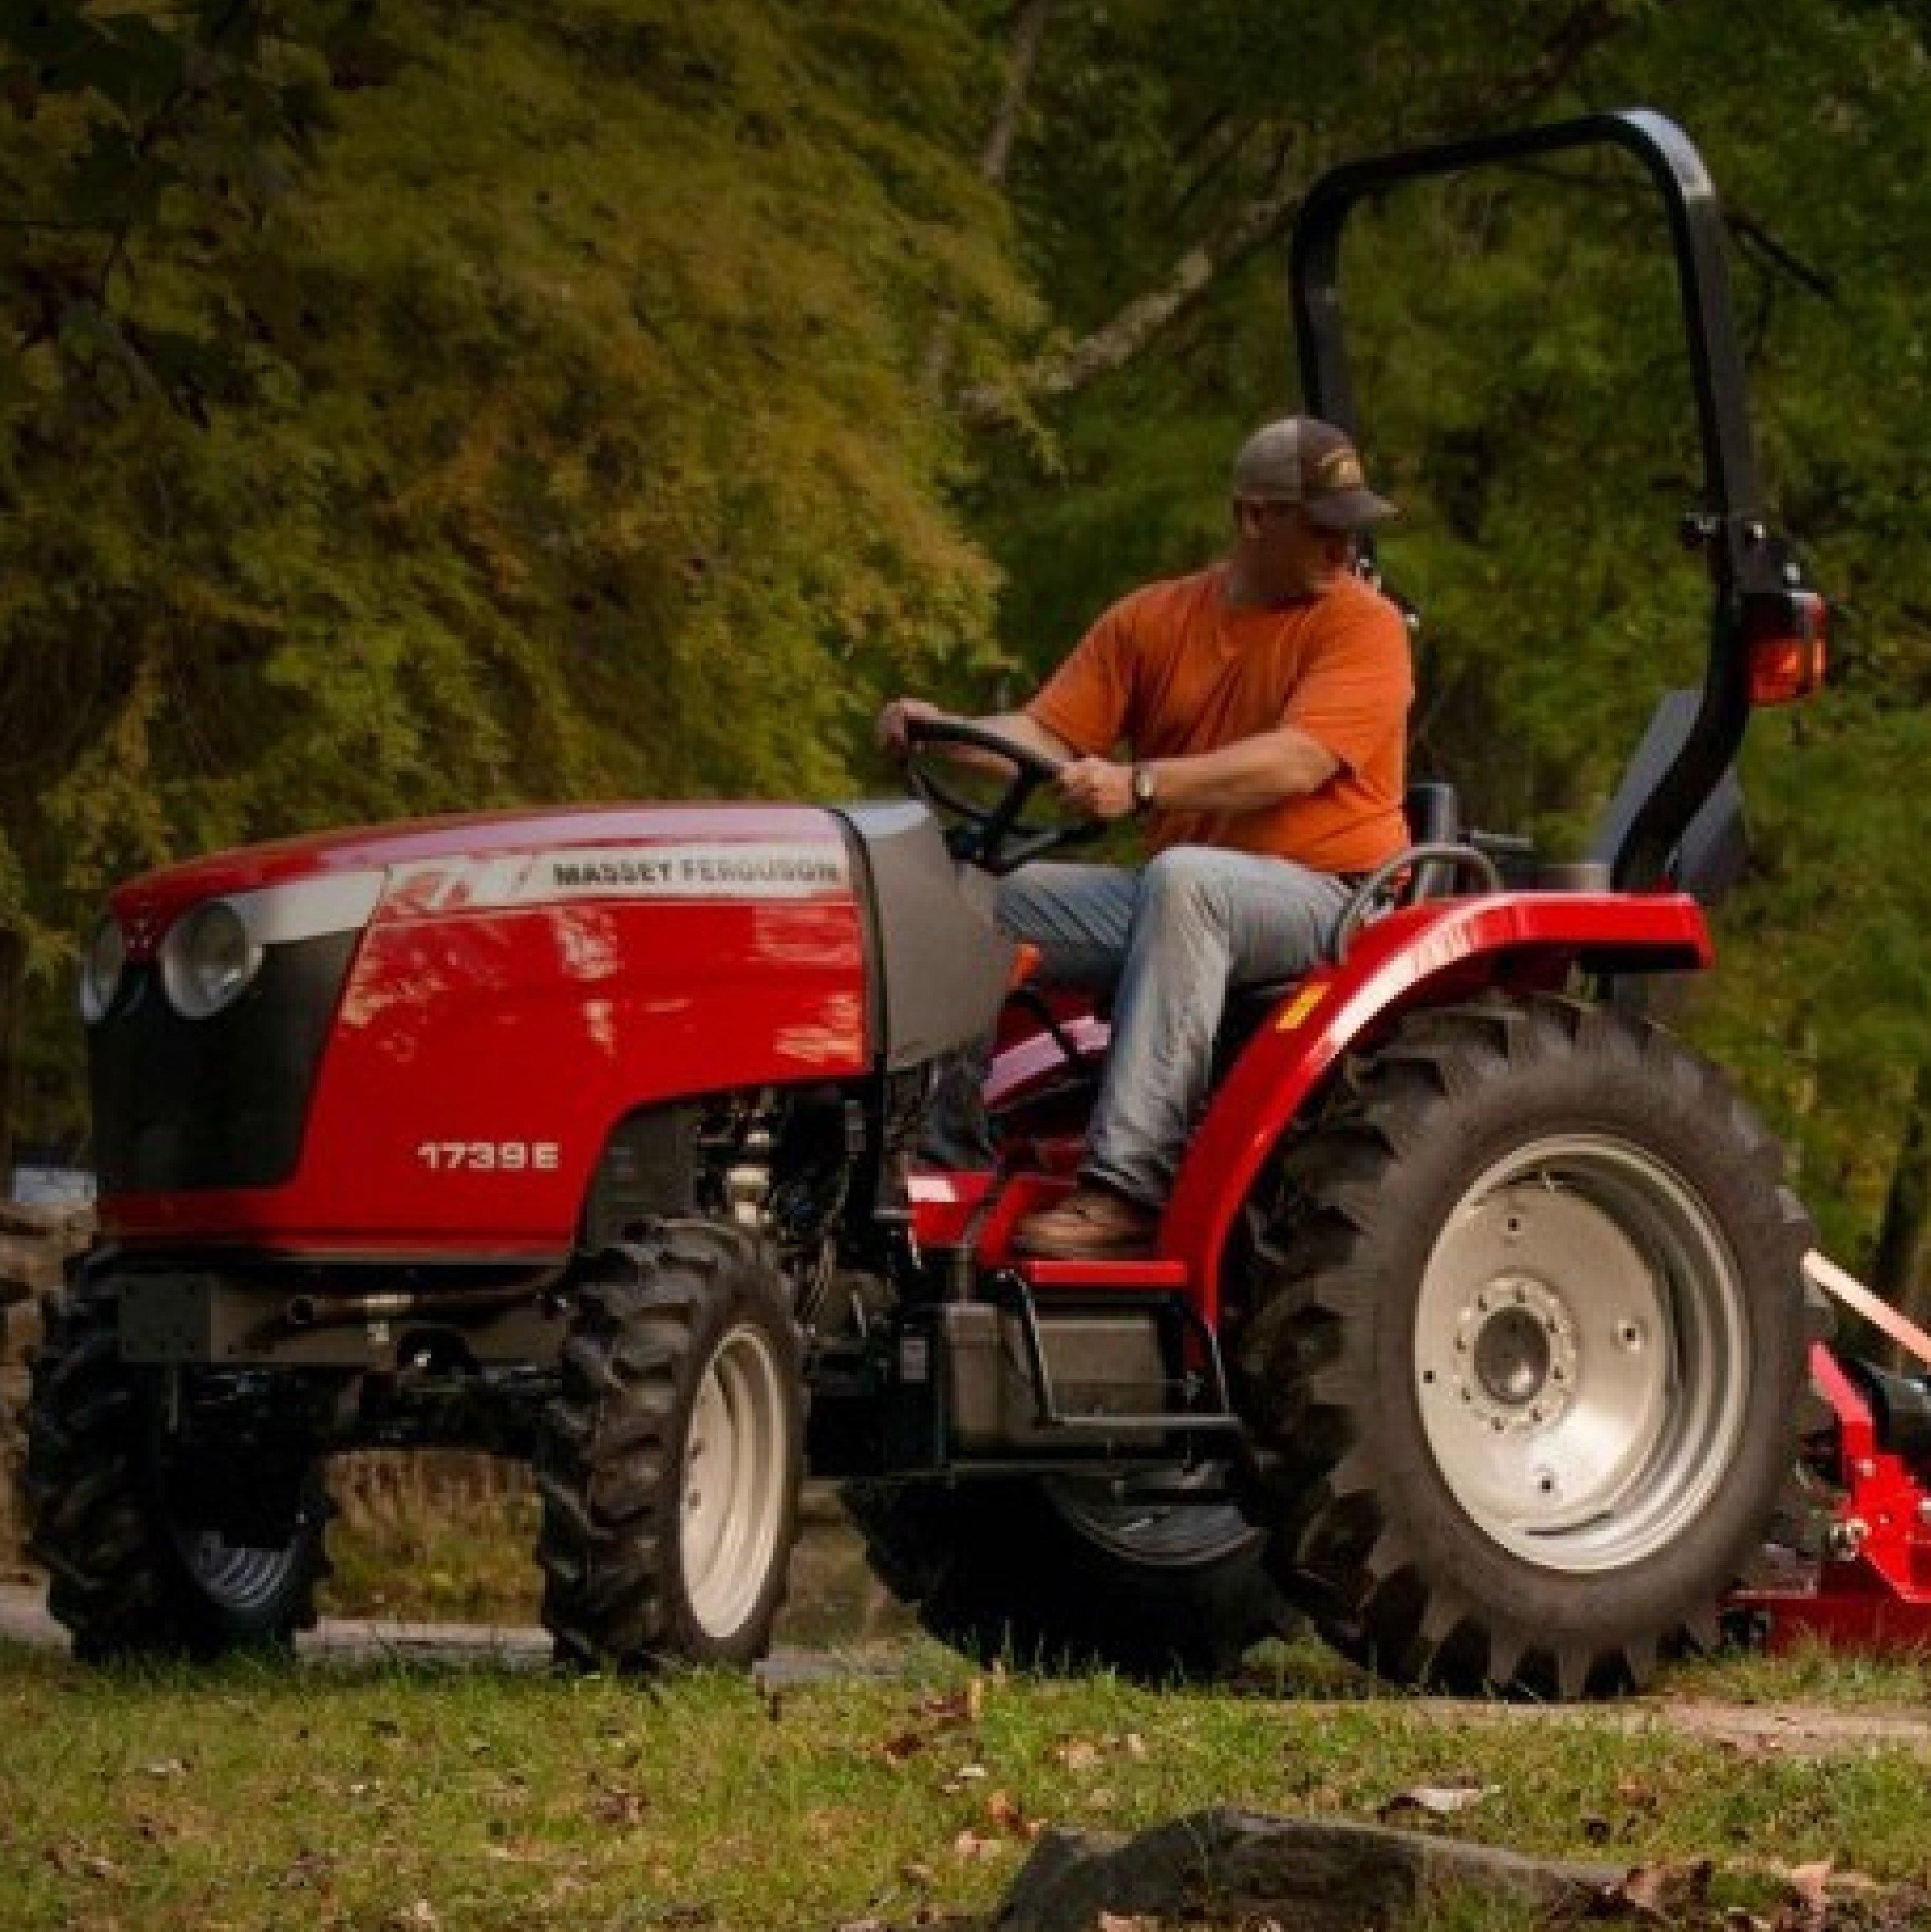 Massey Ferguson 1700E Series Tractors Picture